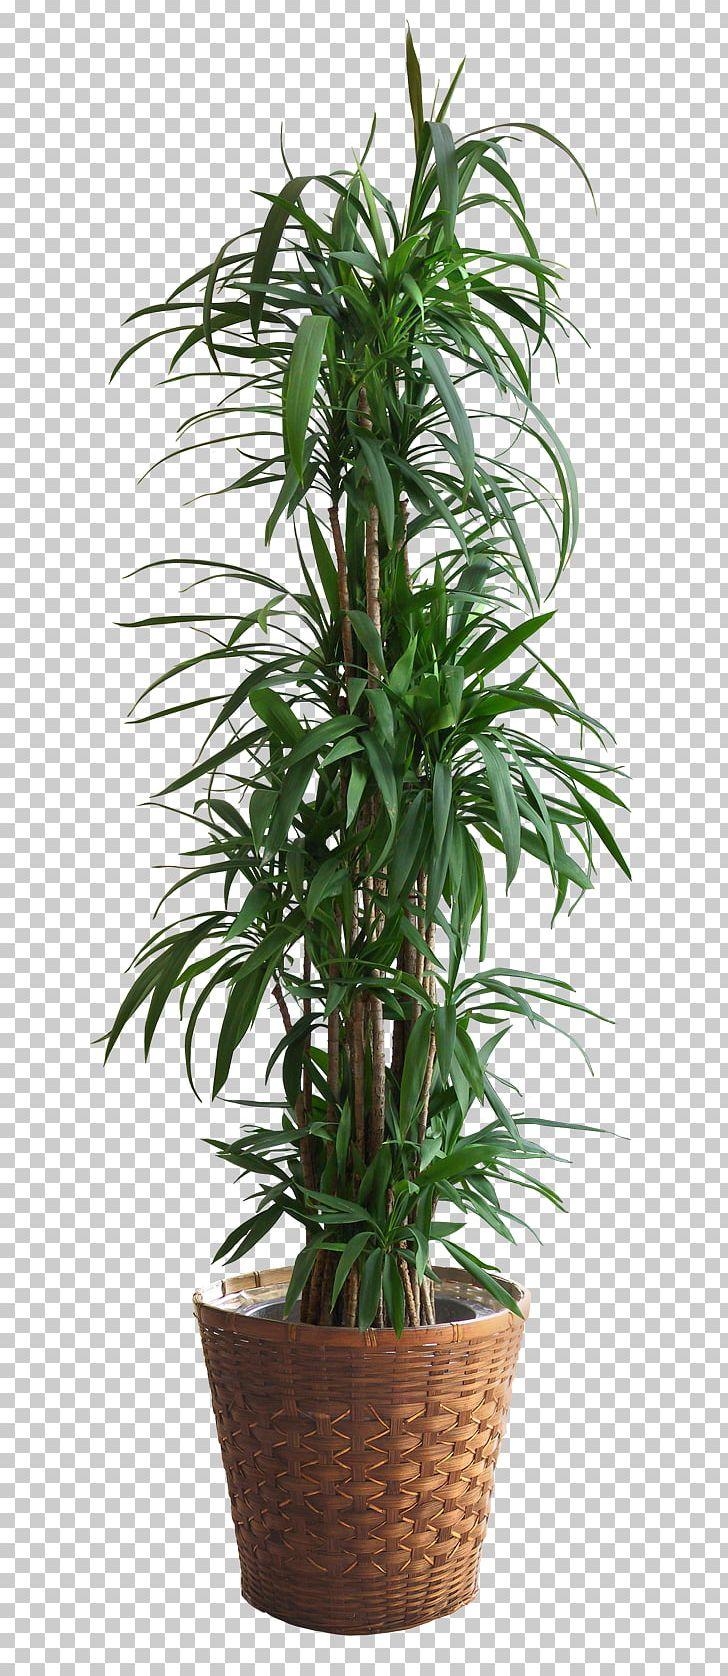 Populus Alba Populus Nigra Plant Tree Png Clipart Arecales Bonsai Cottonwood Cyathea Cooperi Evergreen Free Png